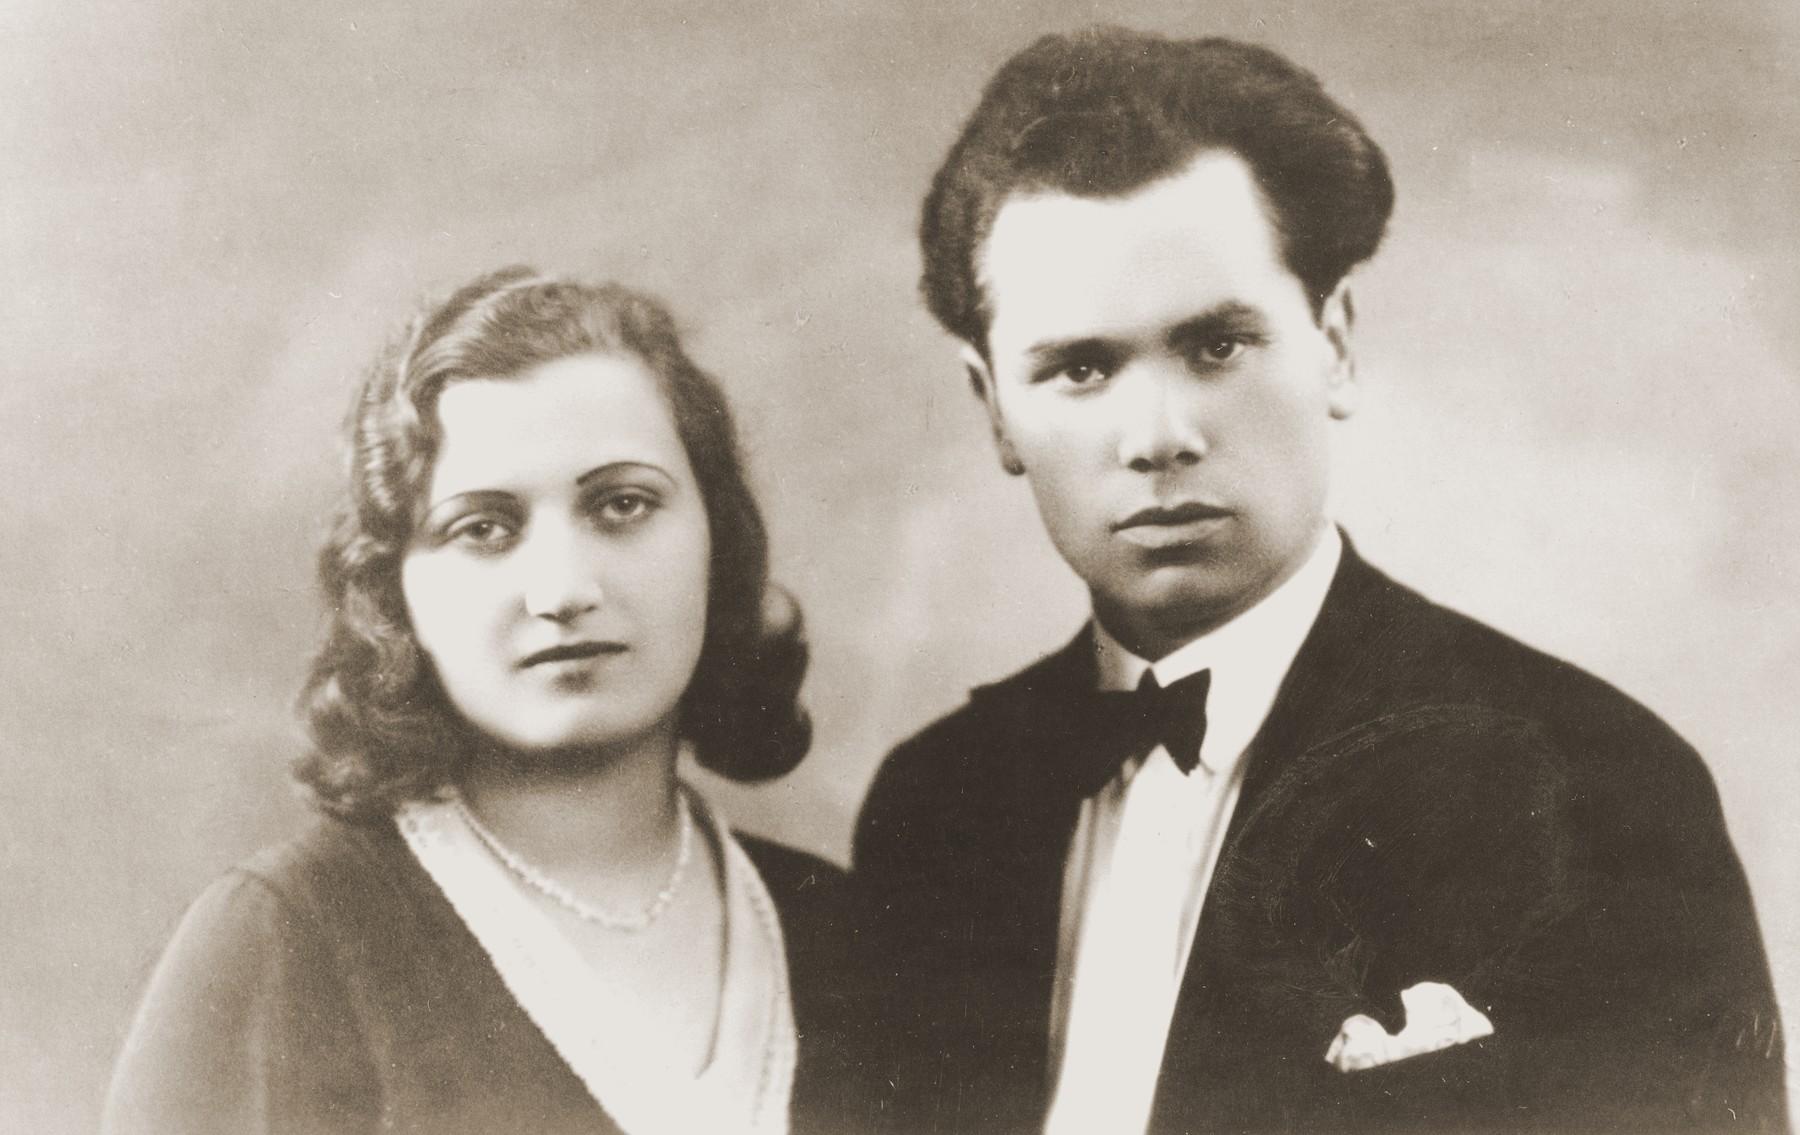 Engagement portrait of a Jewish couple in Kovno, Lithuanian.  Pictured are Liza Zachrozitzki and Jacob Lifschitz.